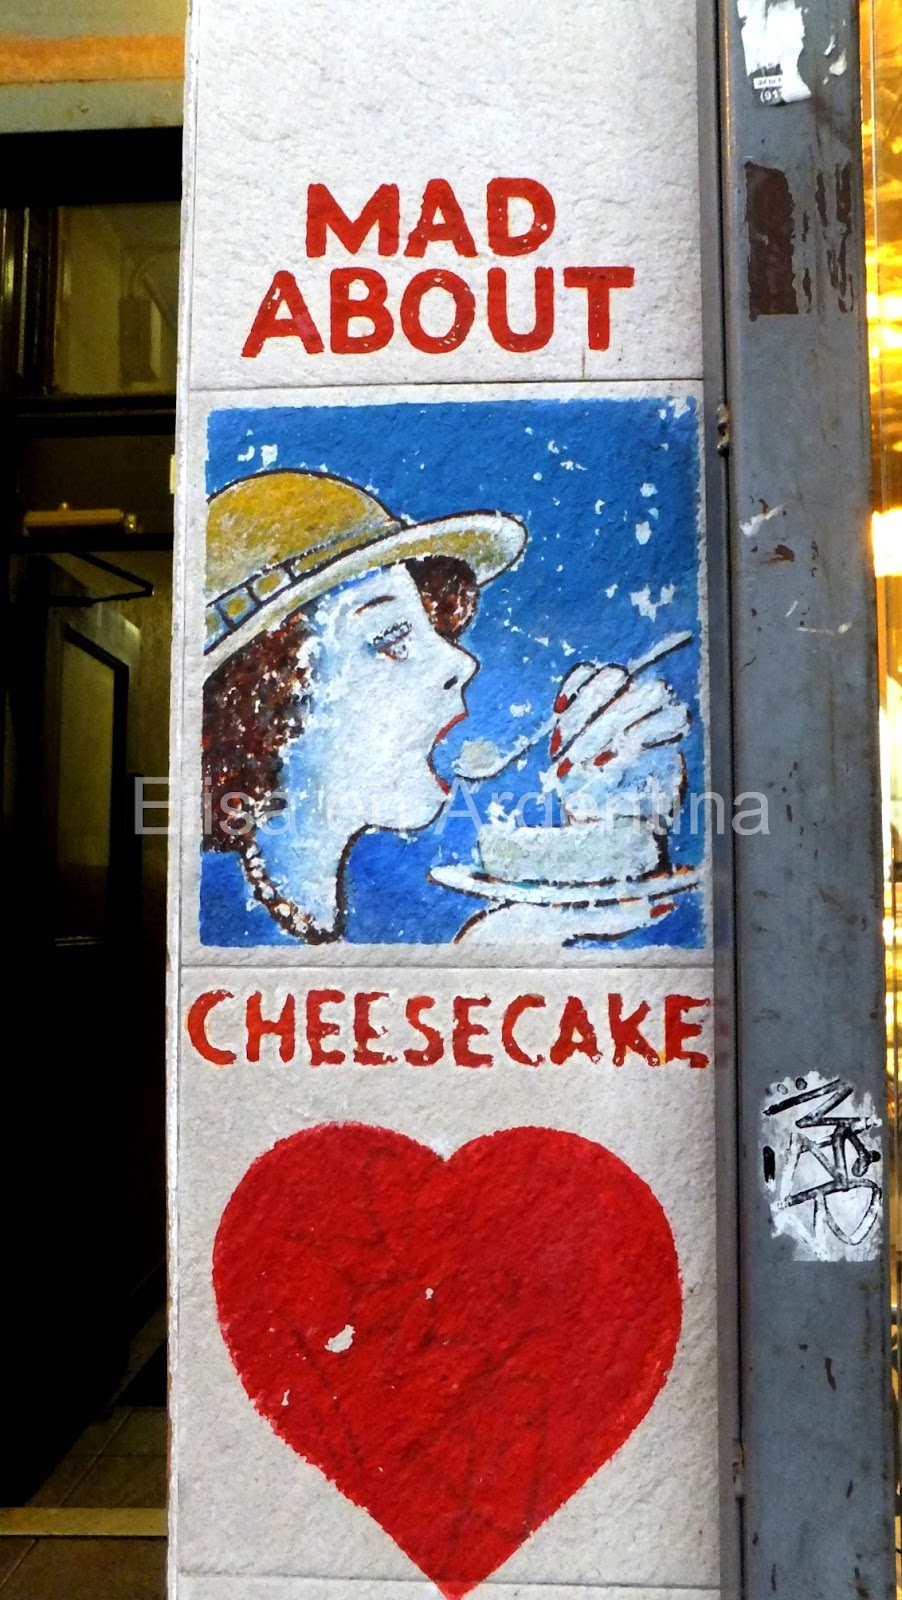 Eileen´s Special Cheescake, New York, Elisa N, Blog de Viajes, Lifestyle, Travel